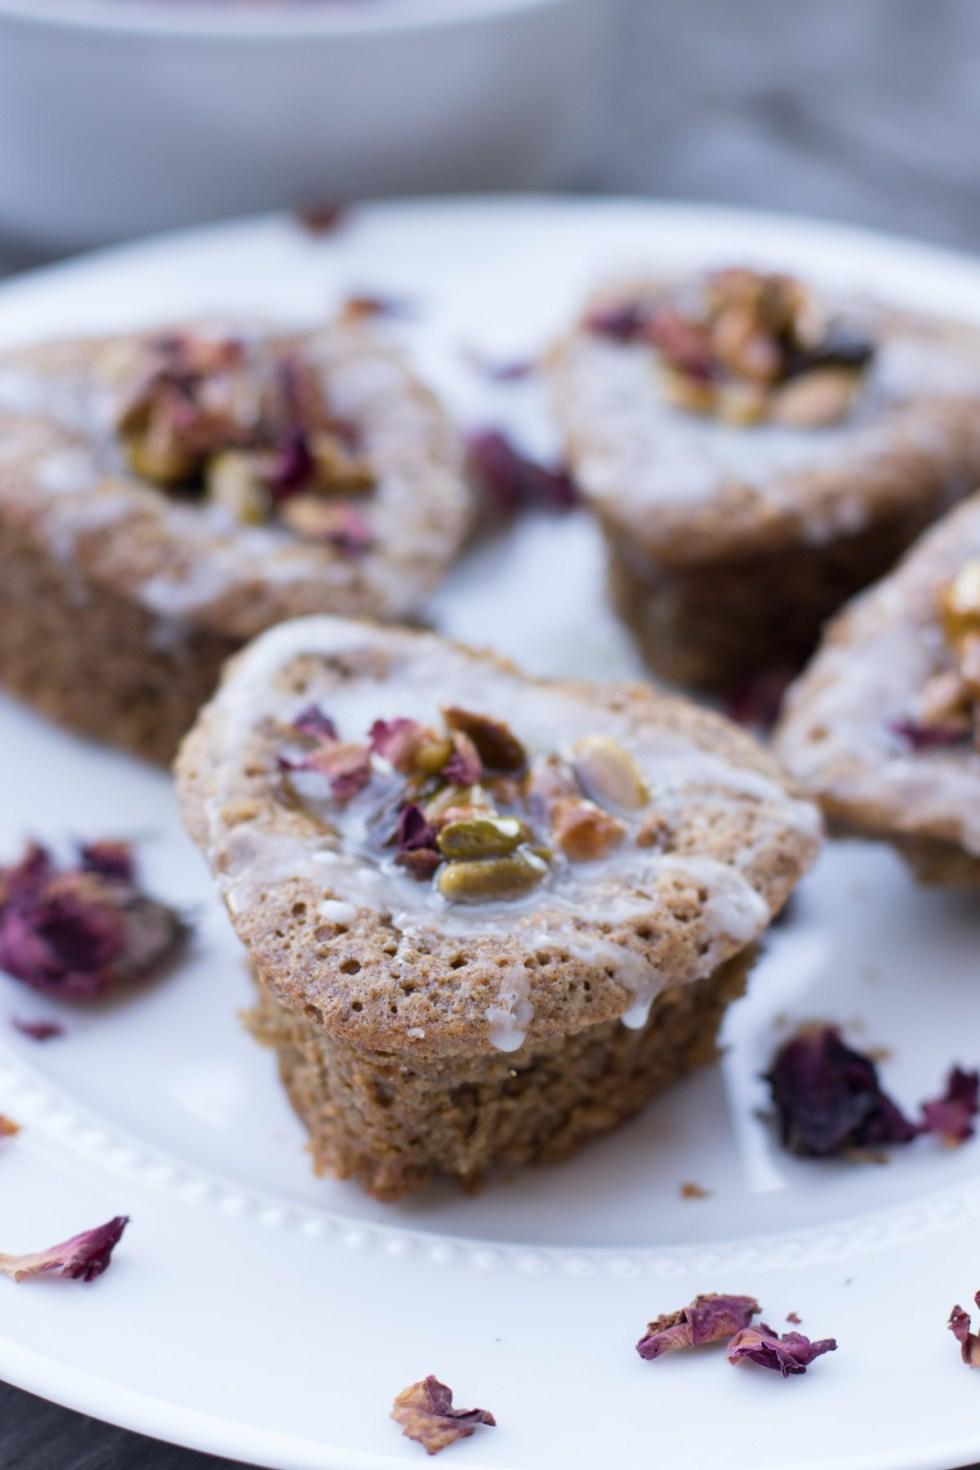 Pistachio, cardamom and lemon drizzle cake | circleofeaters.com